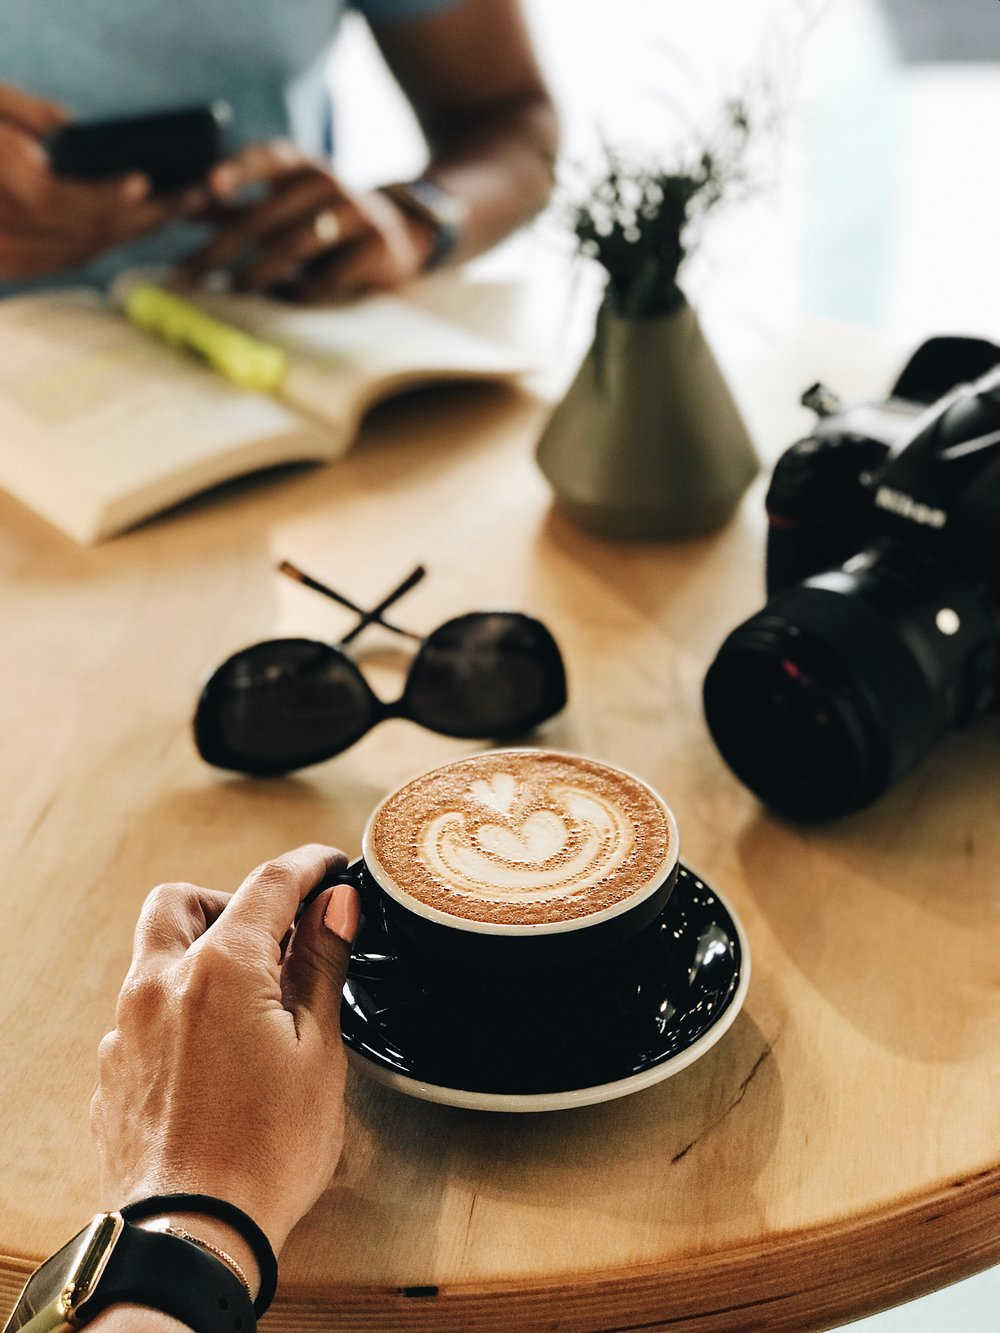 LIneage Coffee Roasting, Mills/50, Orlando, Fl.